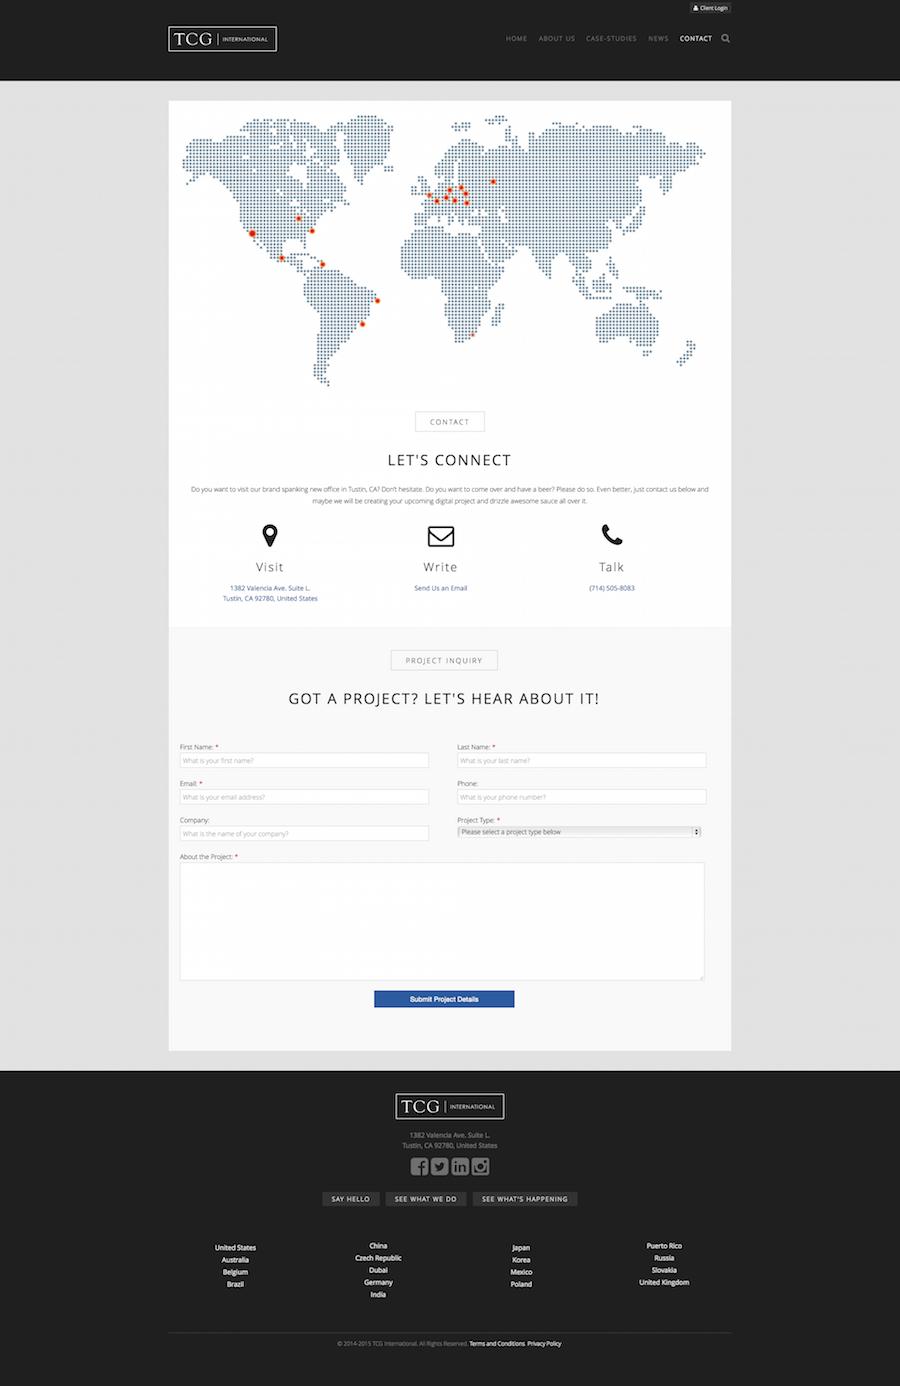 TCG International Contact